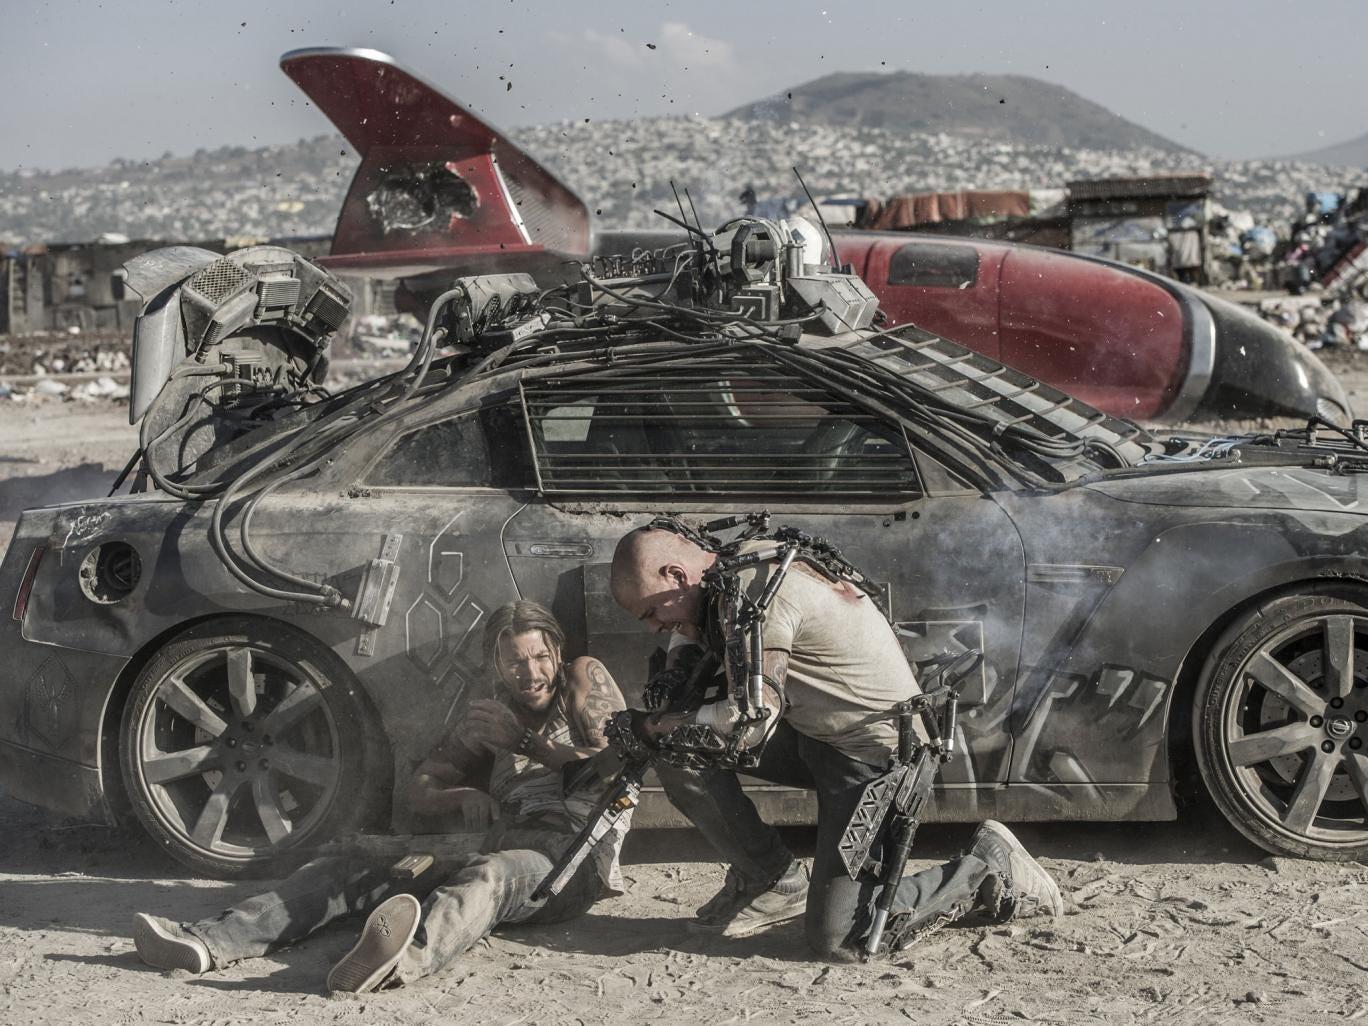 Geared up: Diego Luna and Matt Damon in 'Elysium'